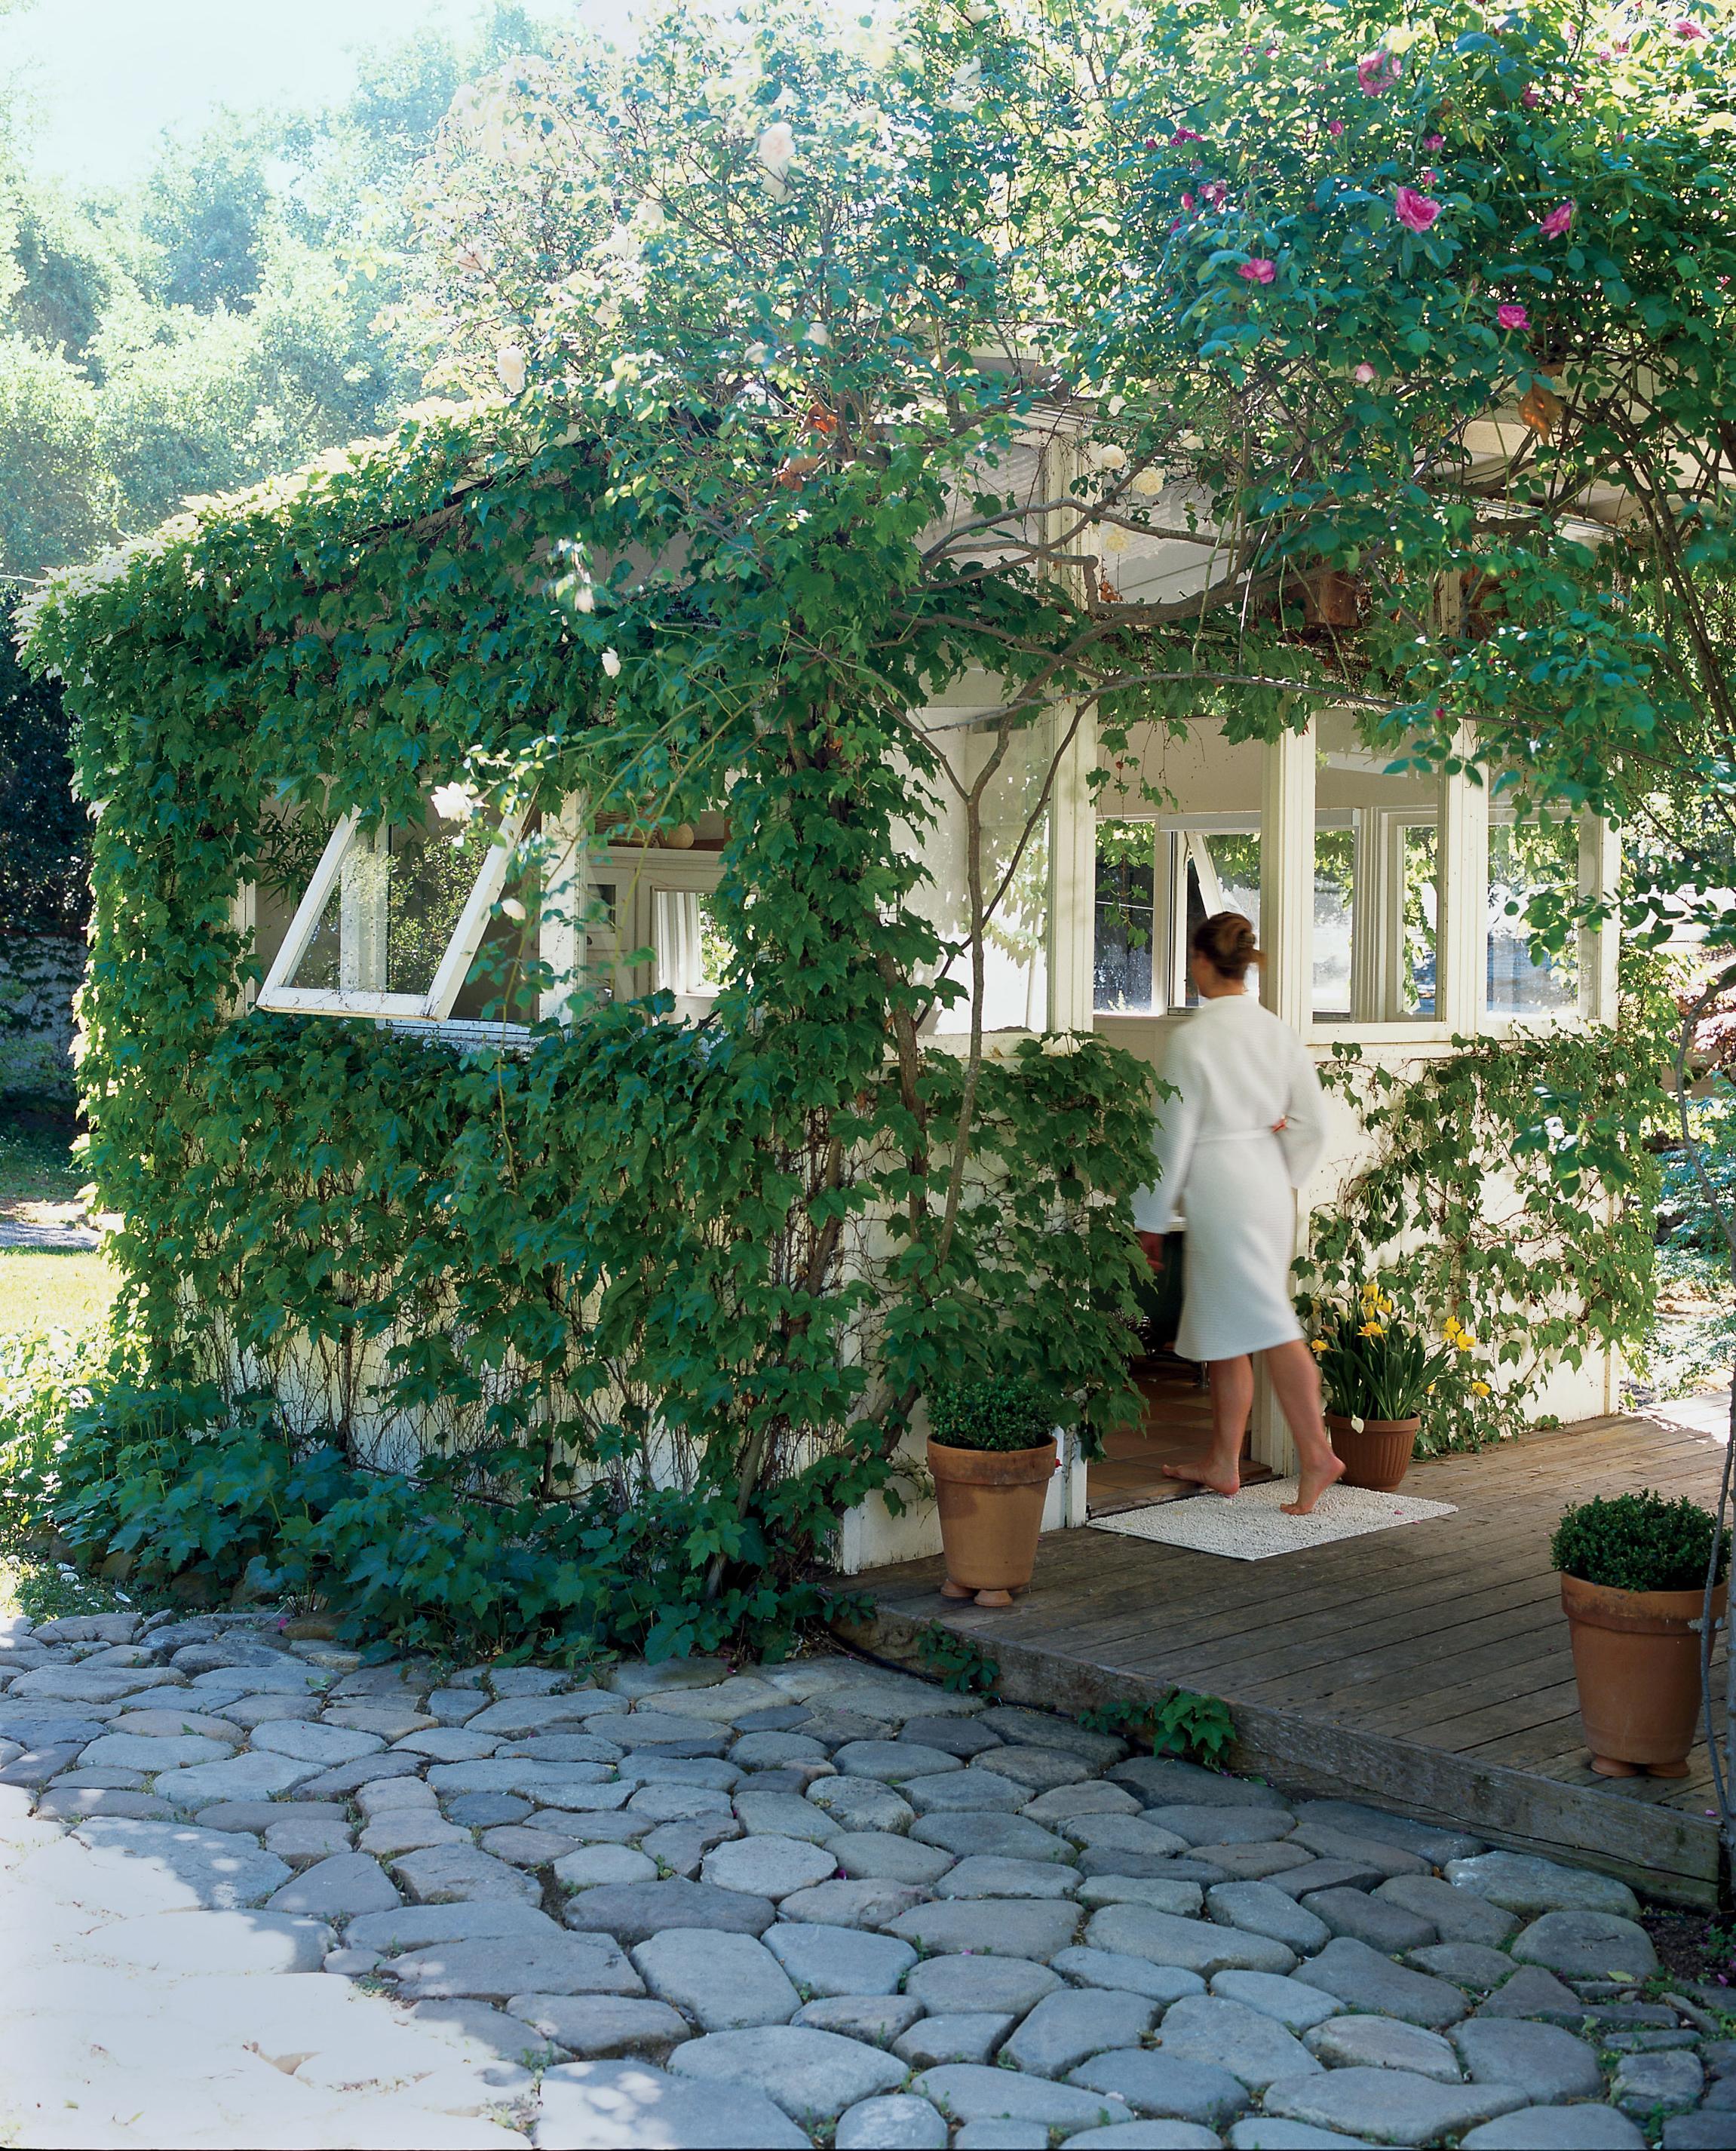 Create Your Own Backyard Spa